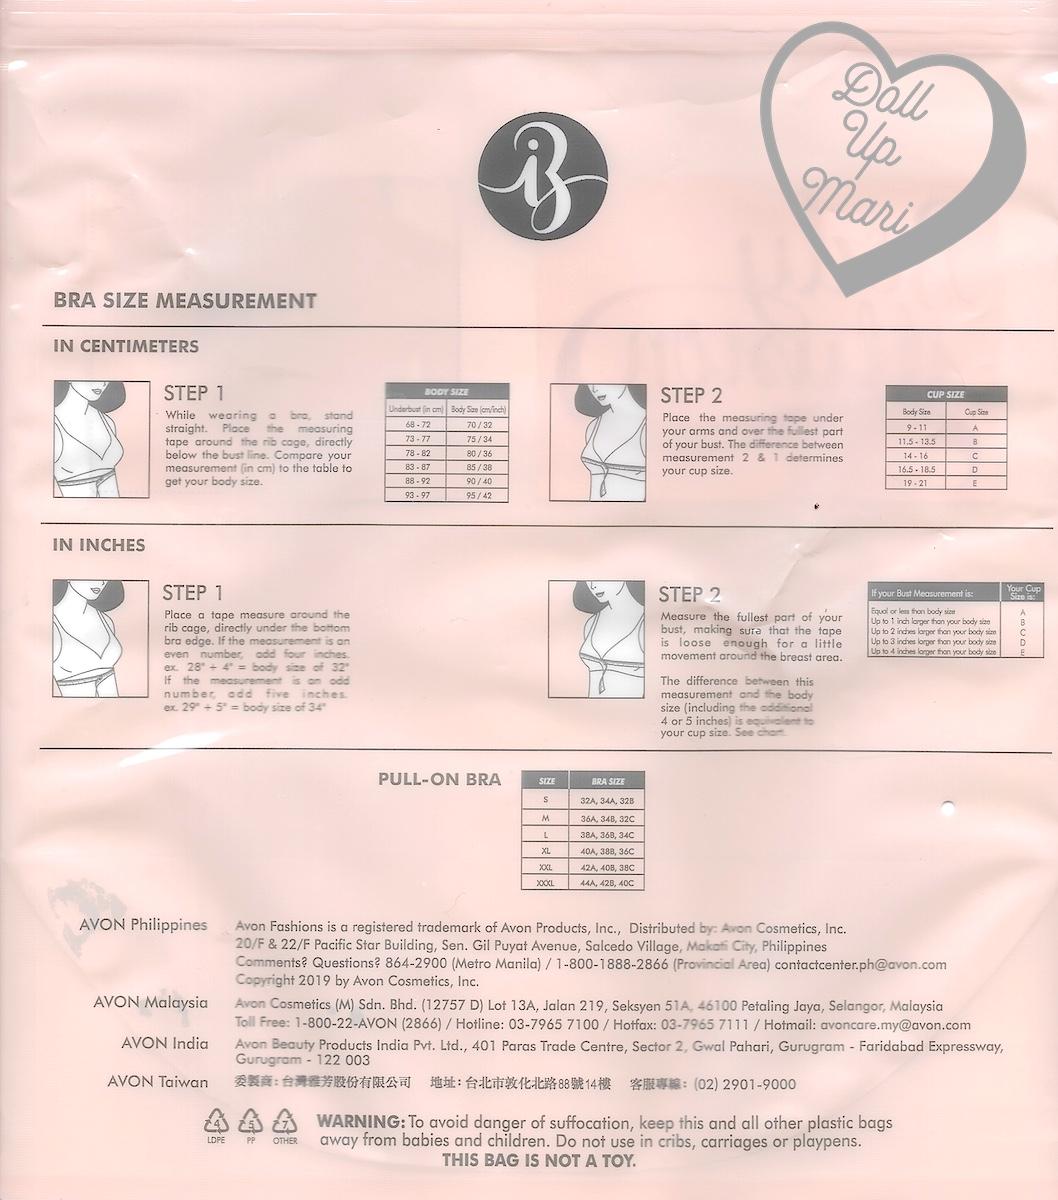 6df5c3bff95 AVON Intimates Body Illusion SONIA Pull-On Bra Size Chart